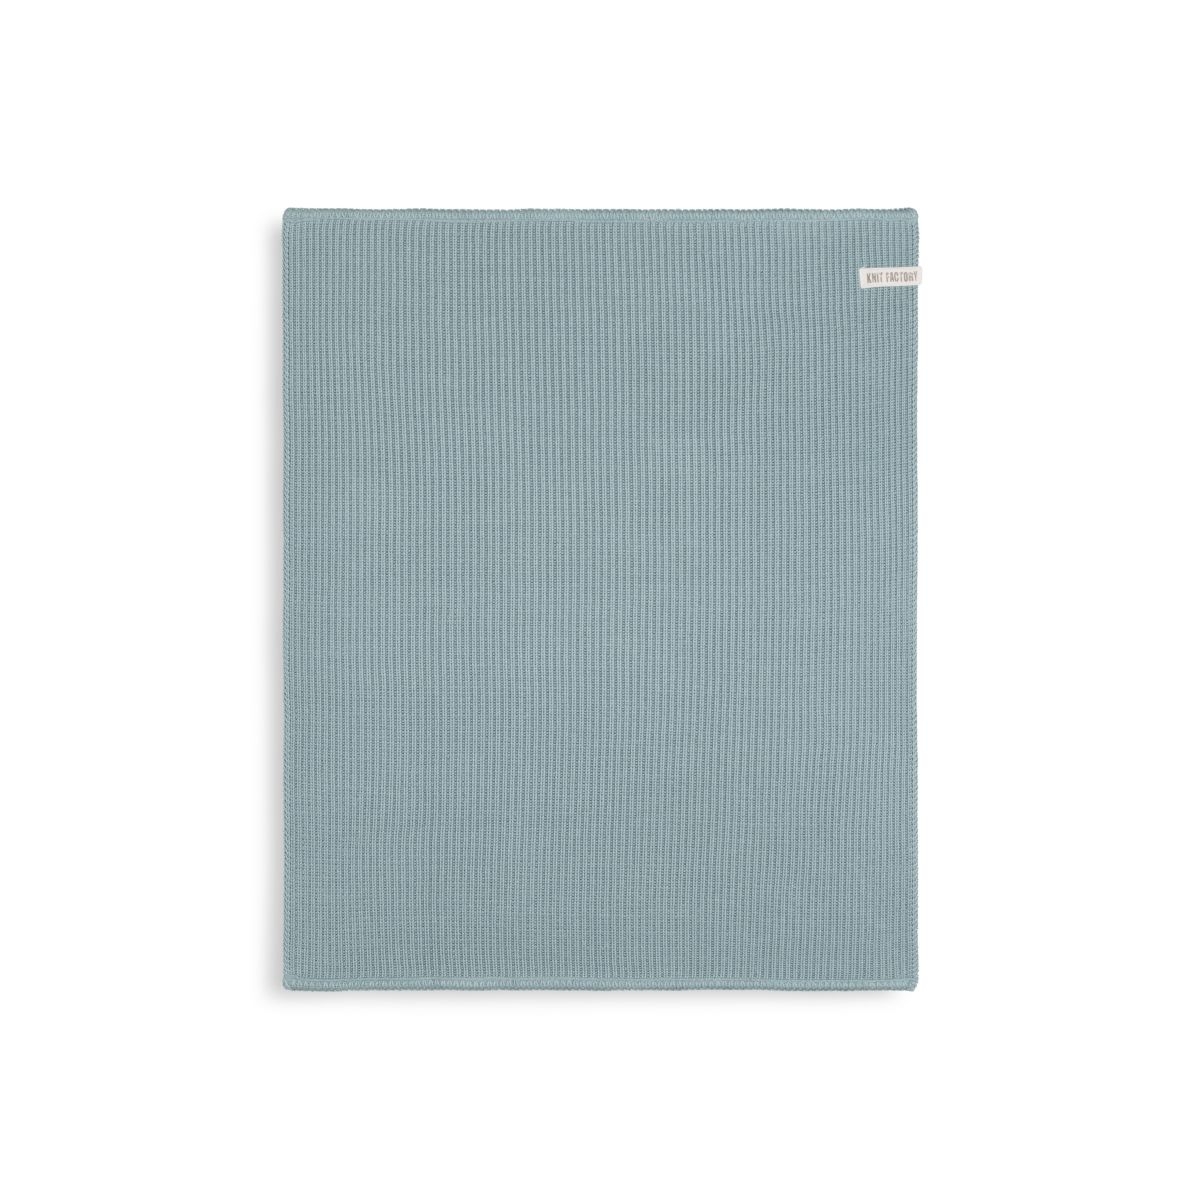 knit factory kf20322800950 badmat morres stone green 60x50 1